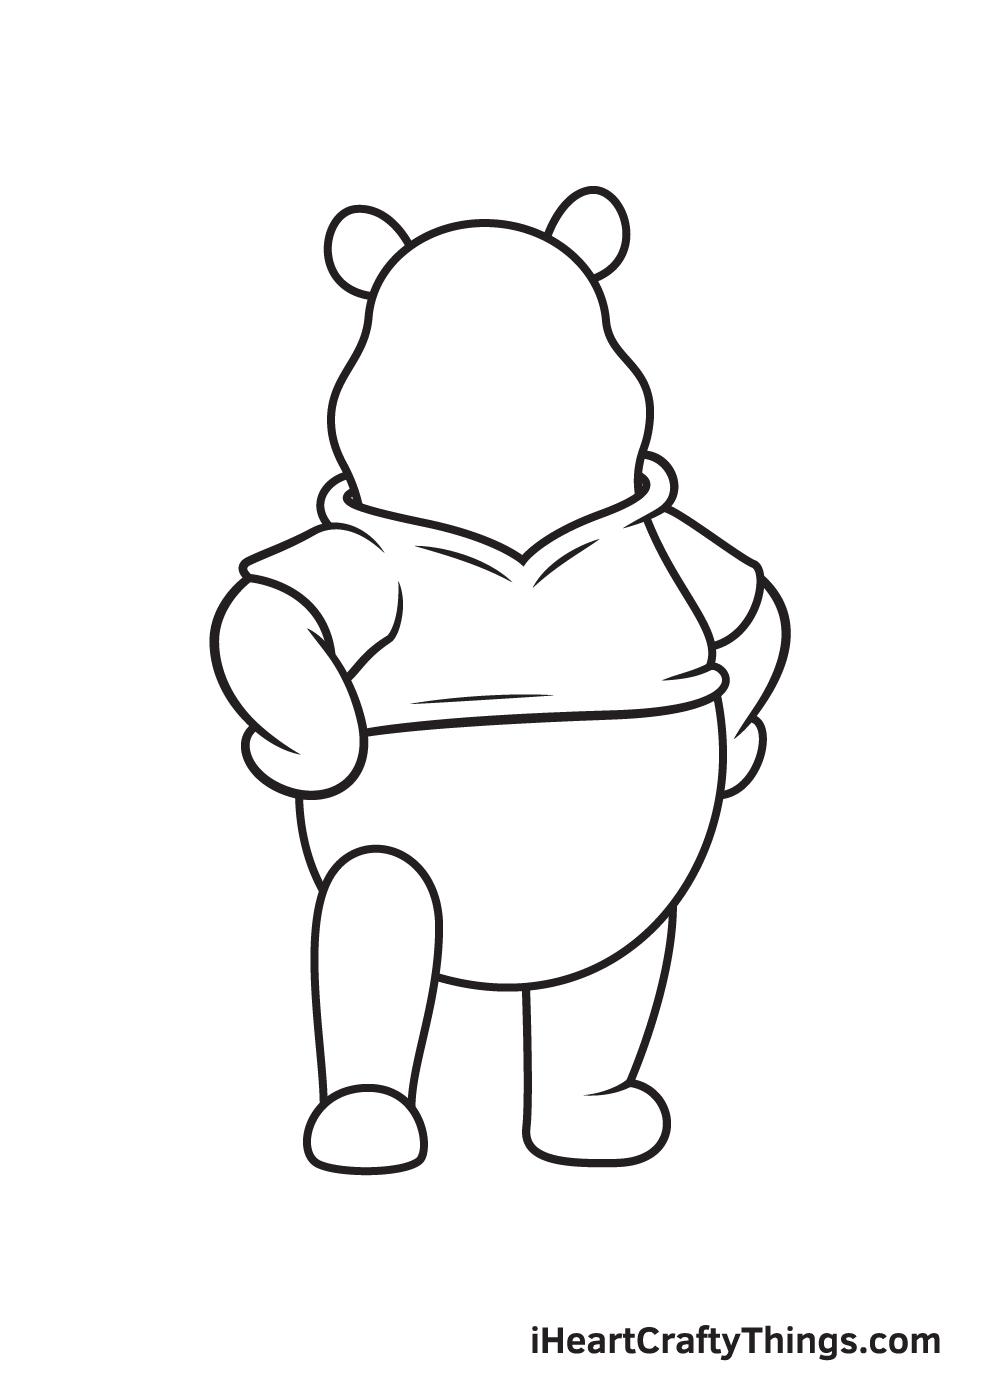 winnie the pooh drawing step 8